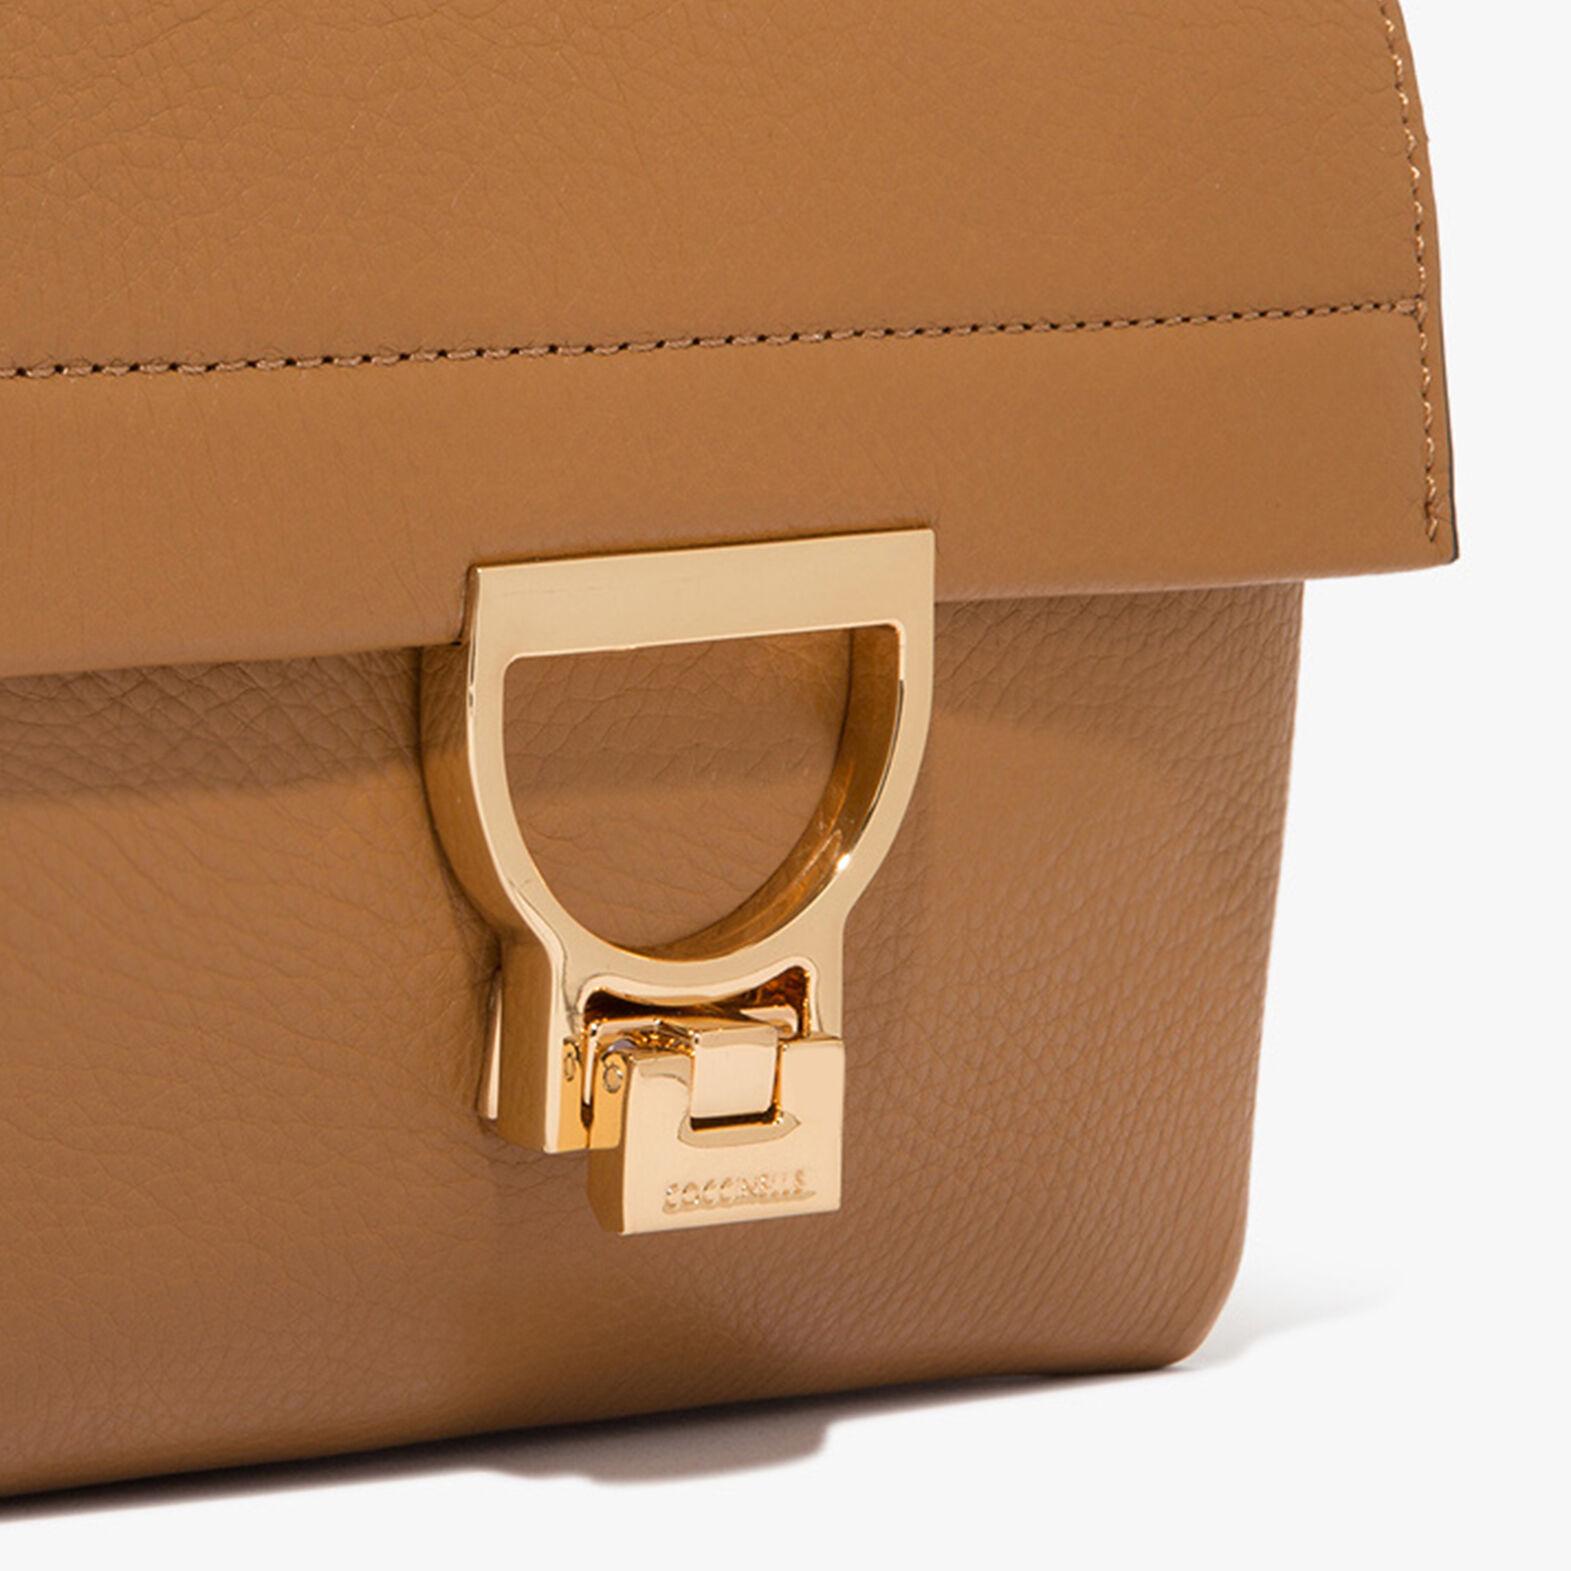 Coccinelle Arlettis leather mini bag